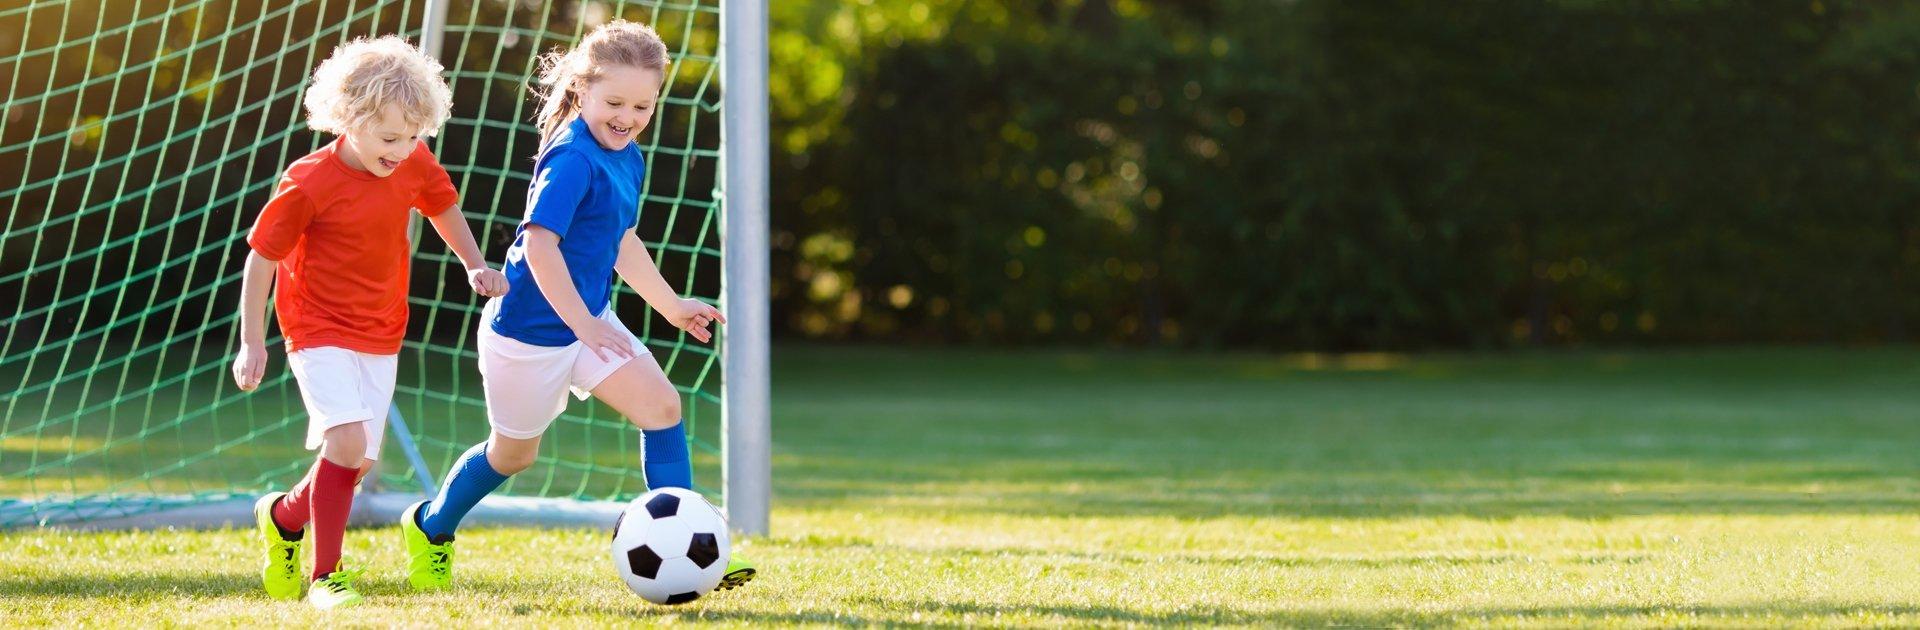 Fußballschule im Familienurlaub